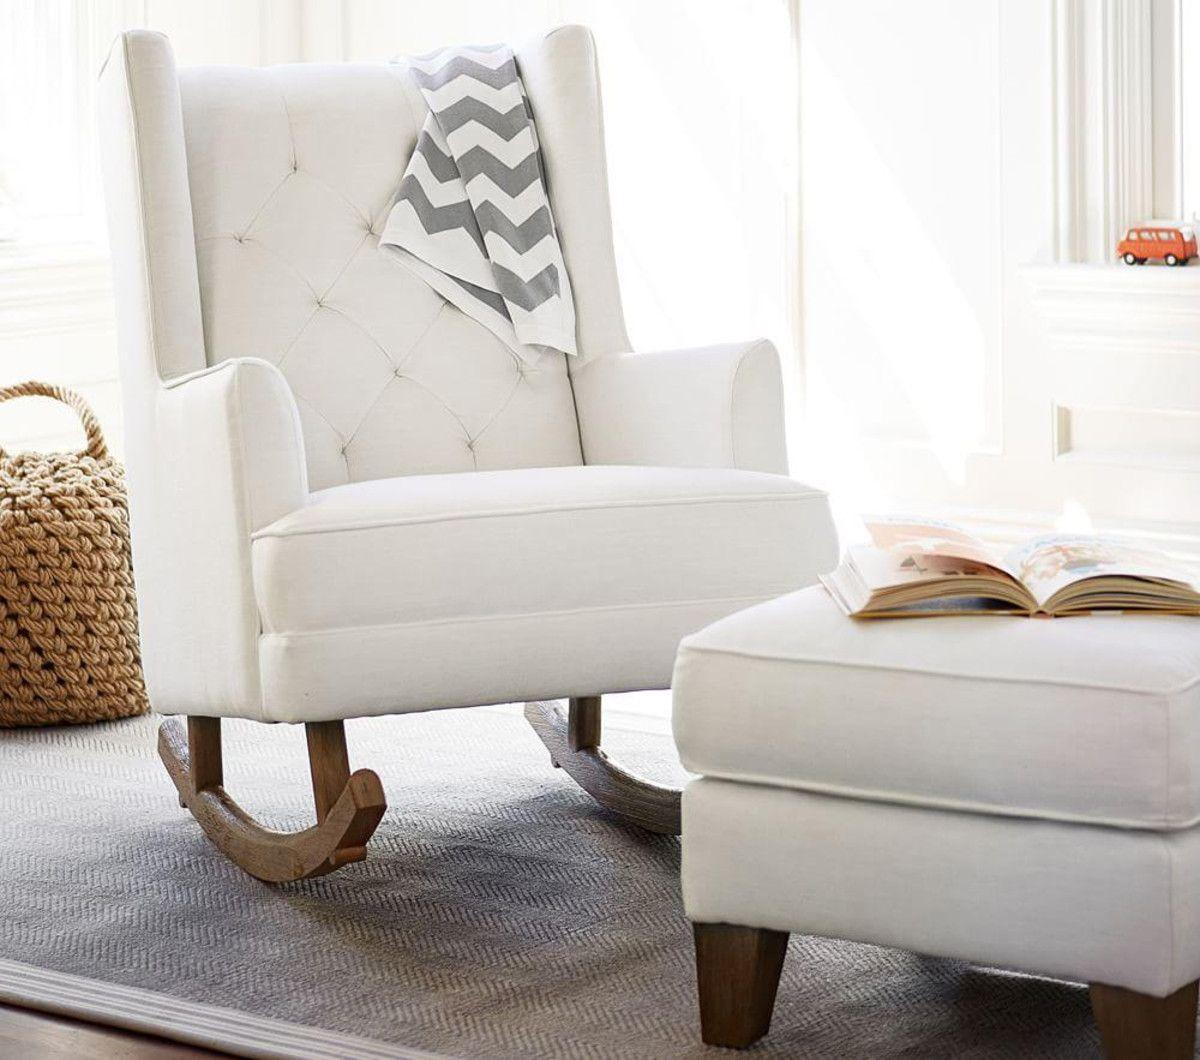 Modern Tufted Wingback Rocker, Stylish Nursery Chairs